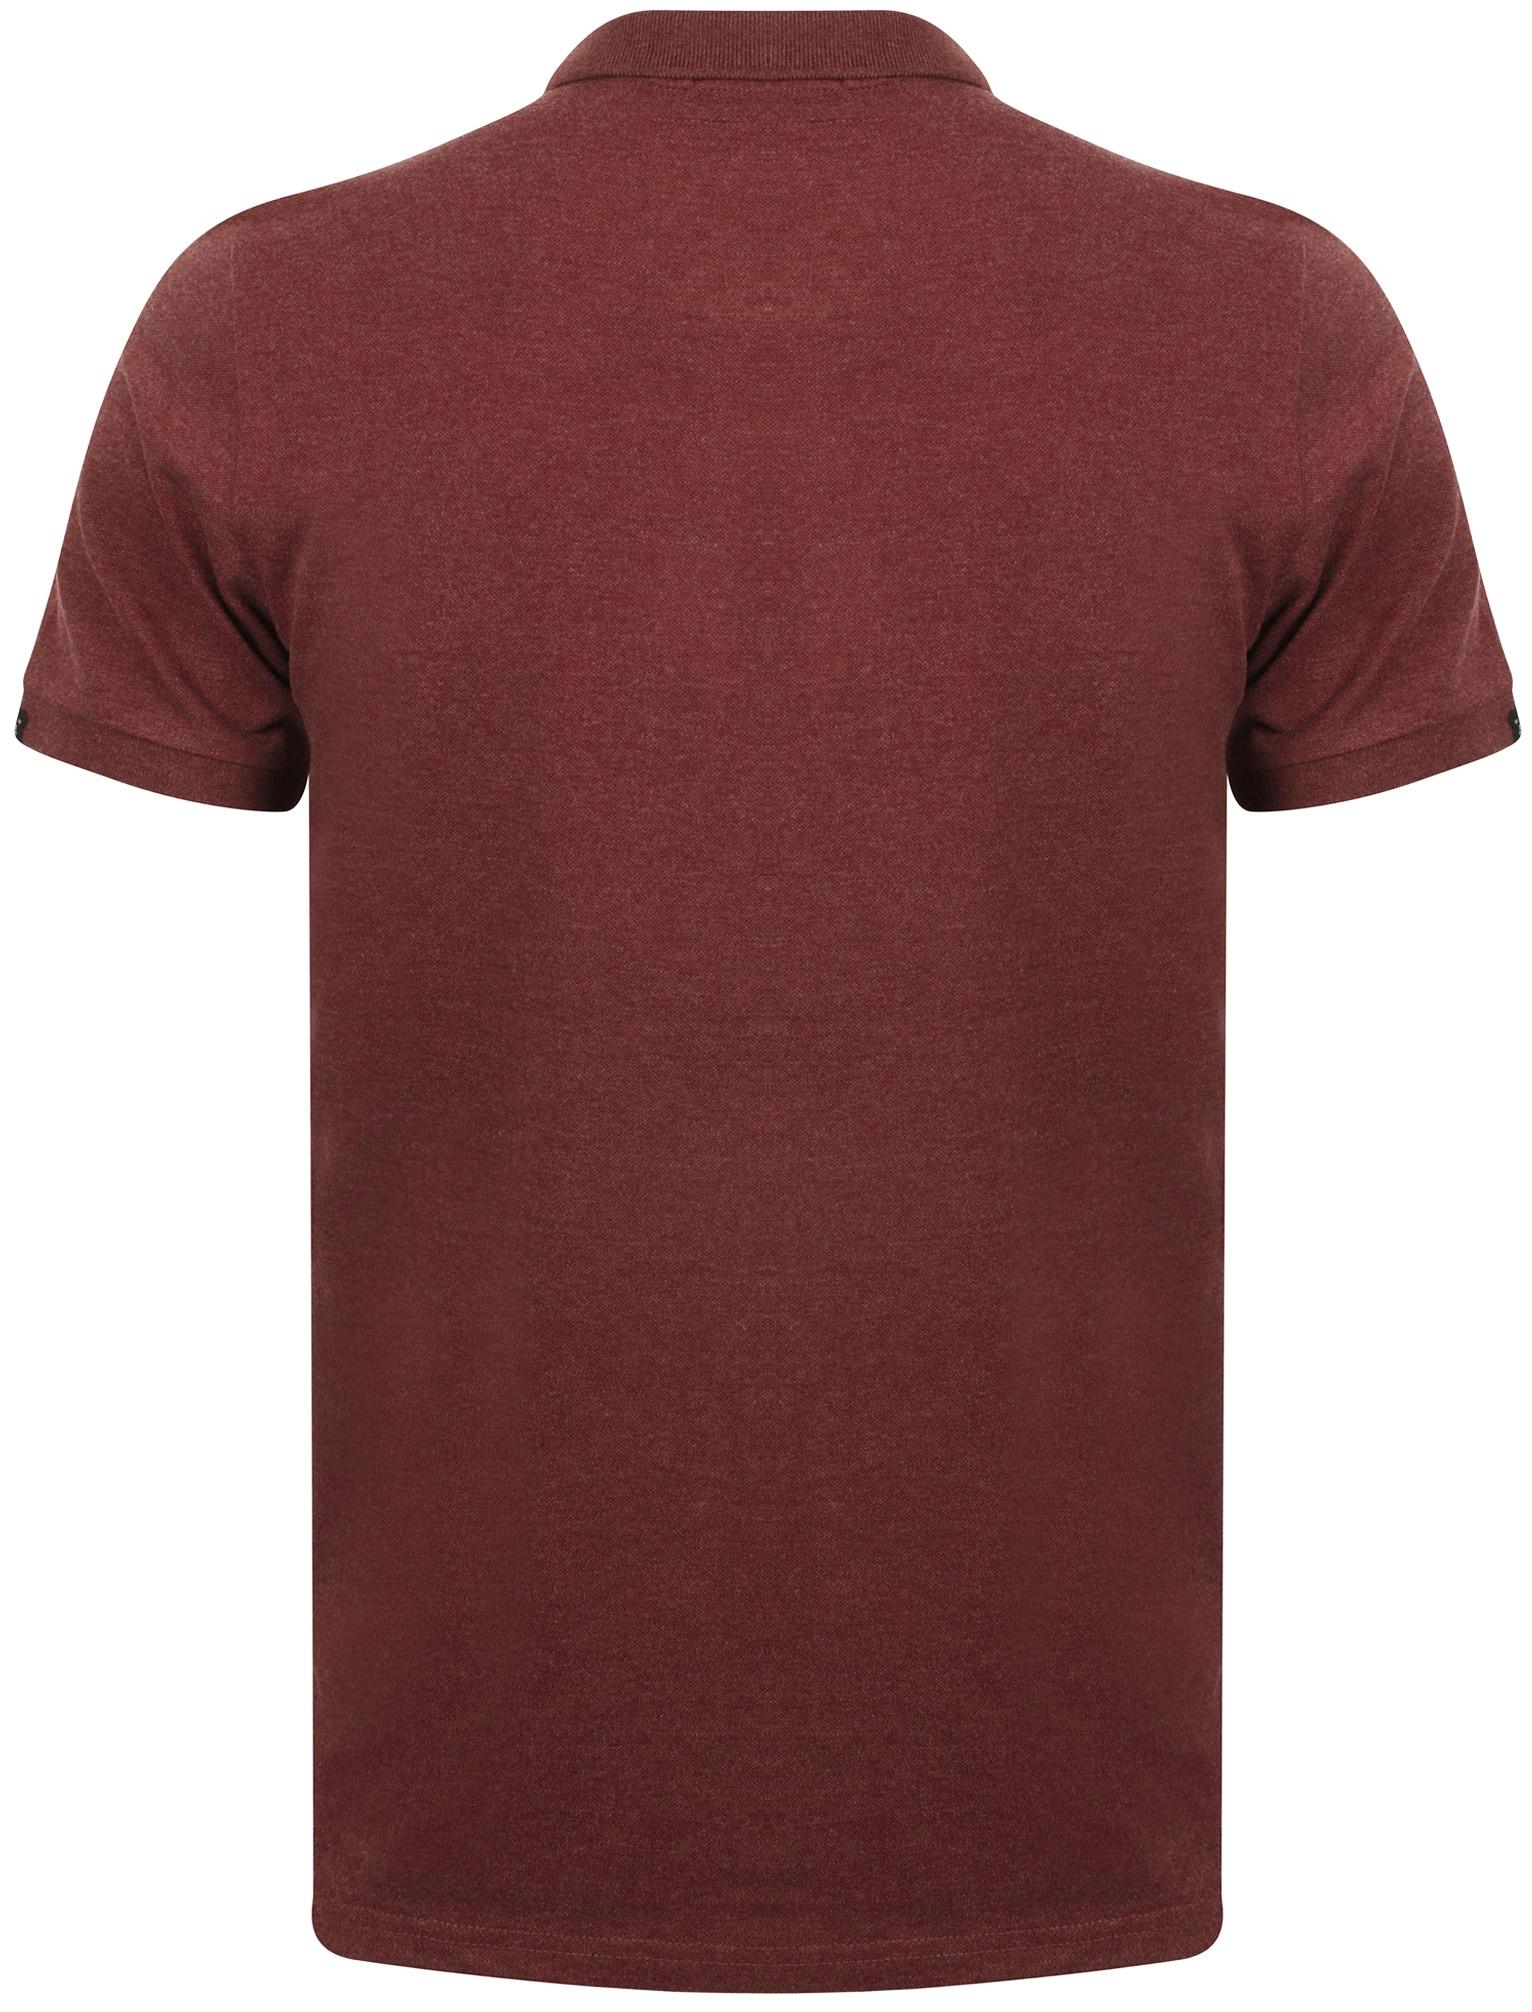 New-Mens-Tokyo-Laundry-Branded-Kuusamo-Cotton-Rich-Pique-Polo-Shirt-Size-S-XXL thumbnail 25